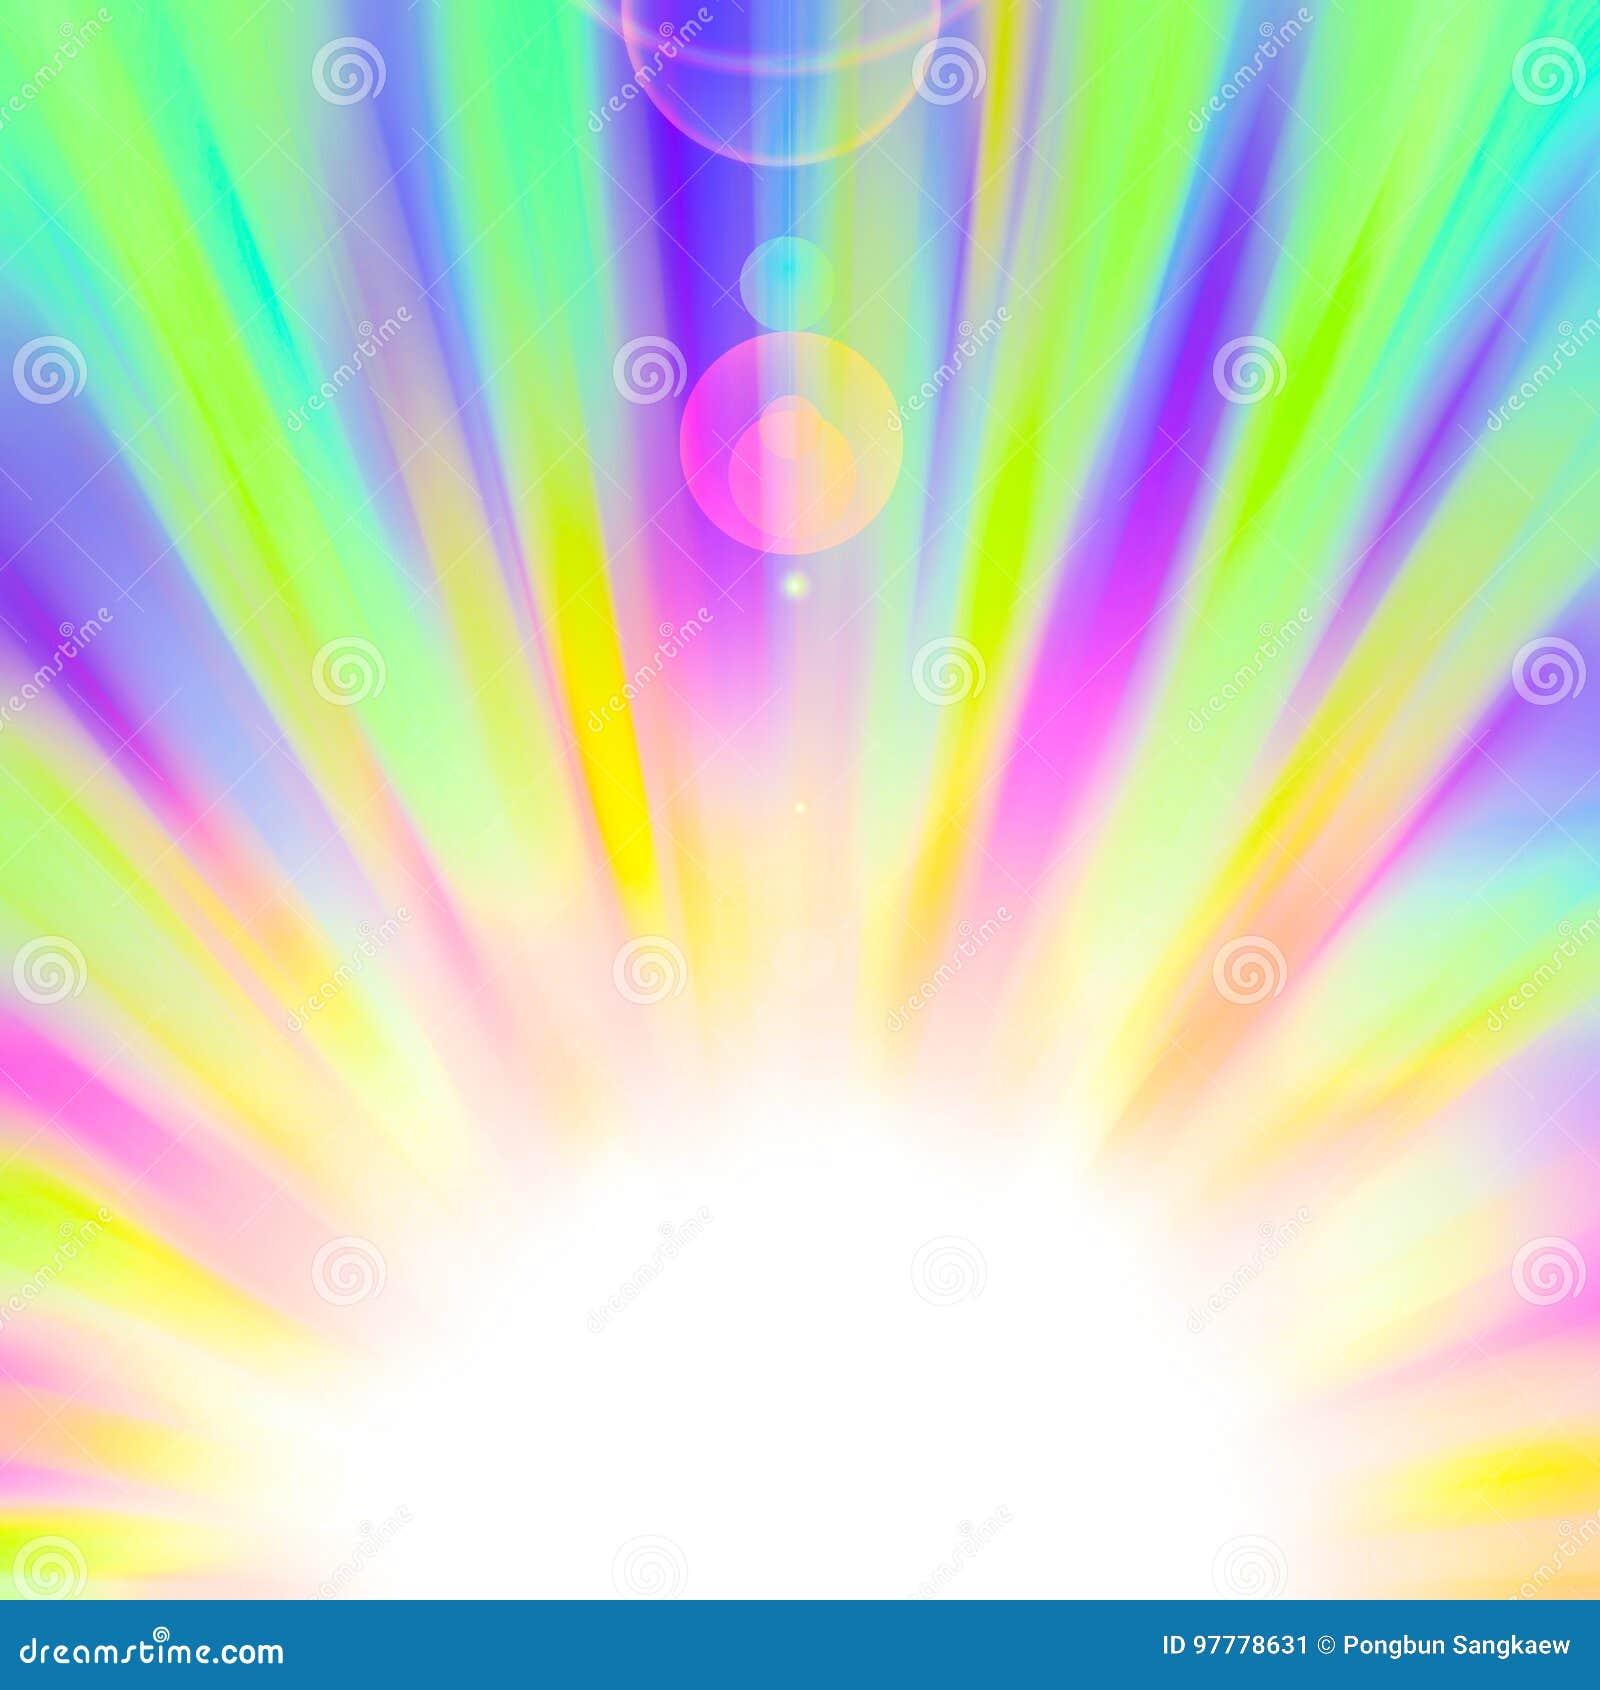 Colorful Rainbow Sunburst Gay Pride Template Banner